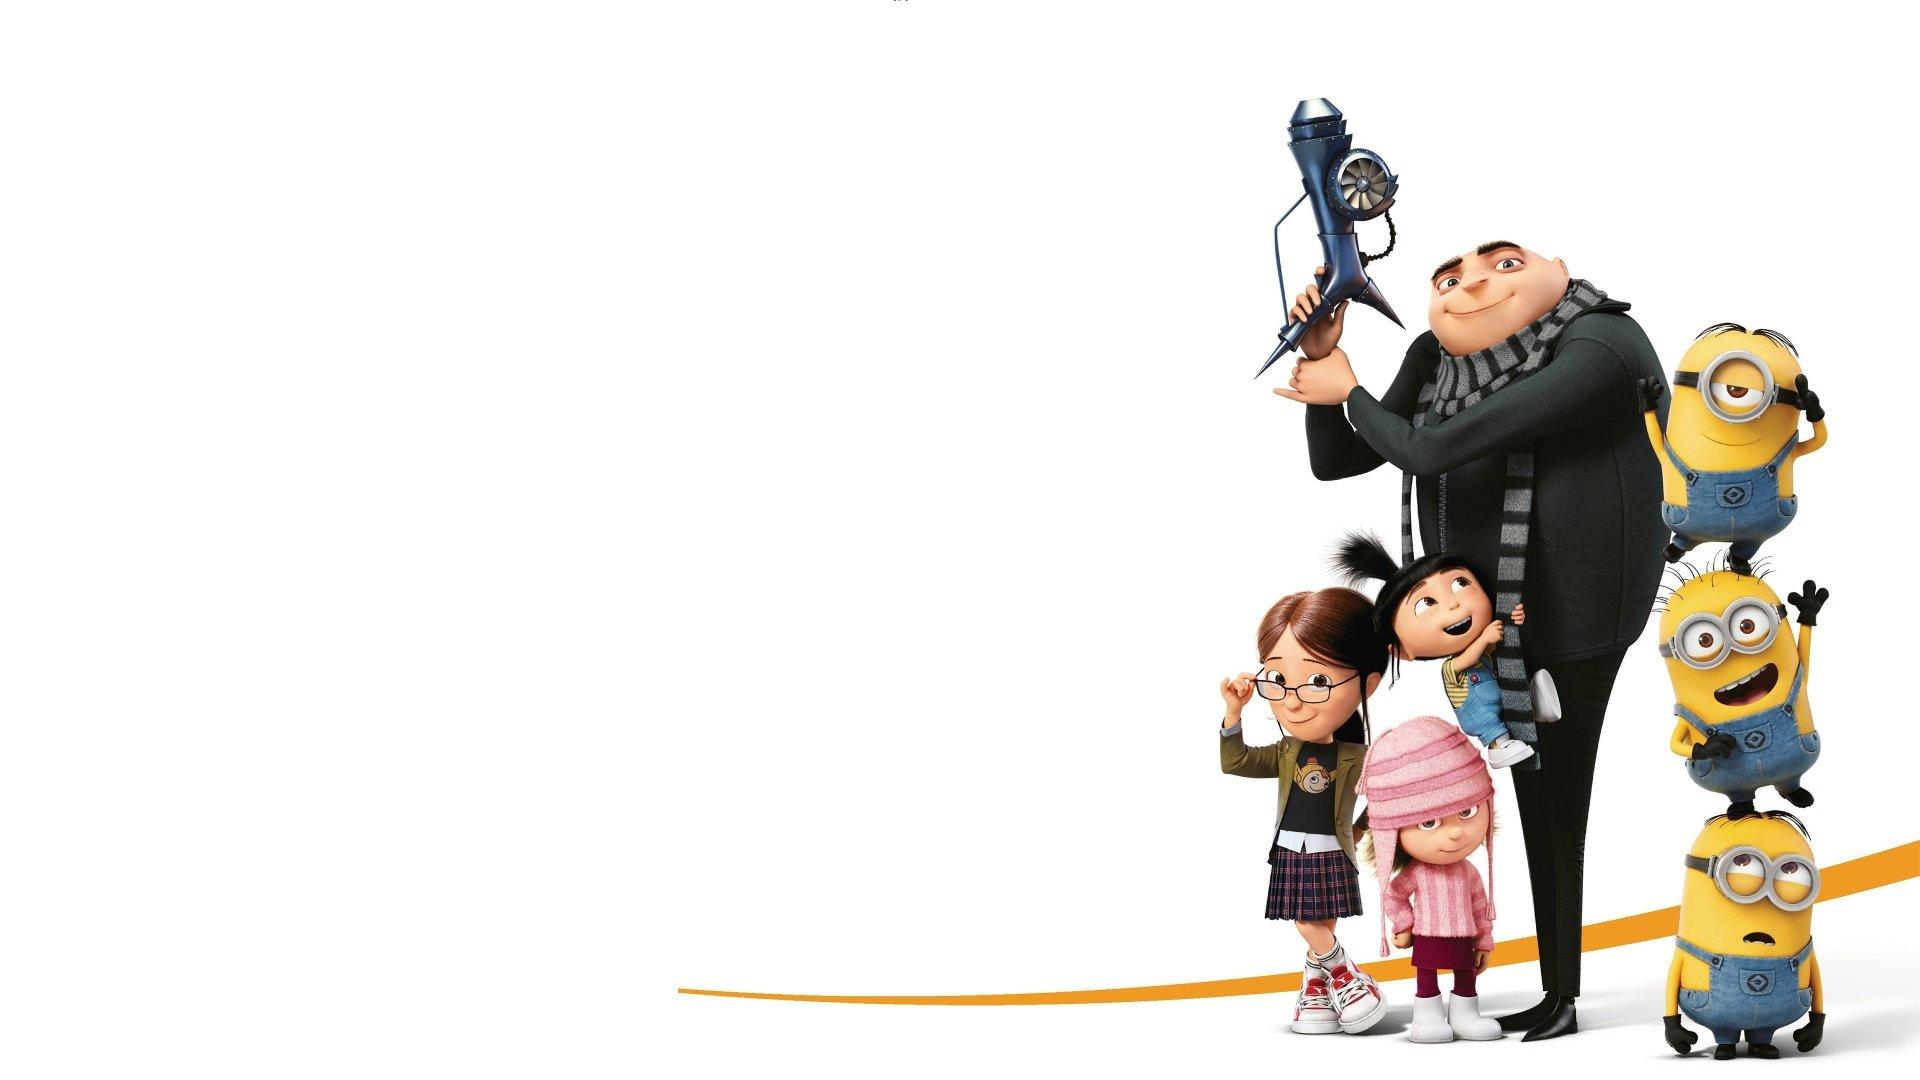 Movie - Despicable Me 3  Gru (Despicable Me) Agnes (Despicable Me) Lucy (Despicable Me) Margo (Despicable Me) Wallpaper